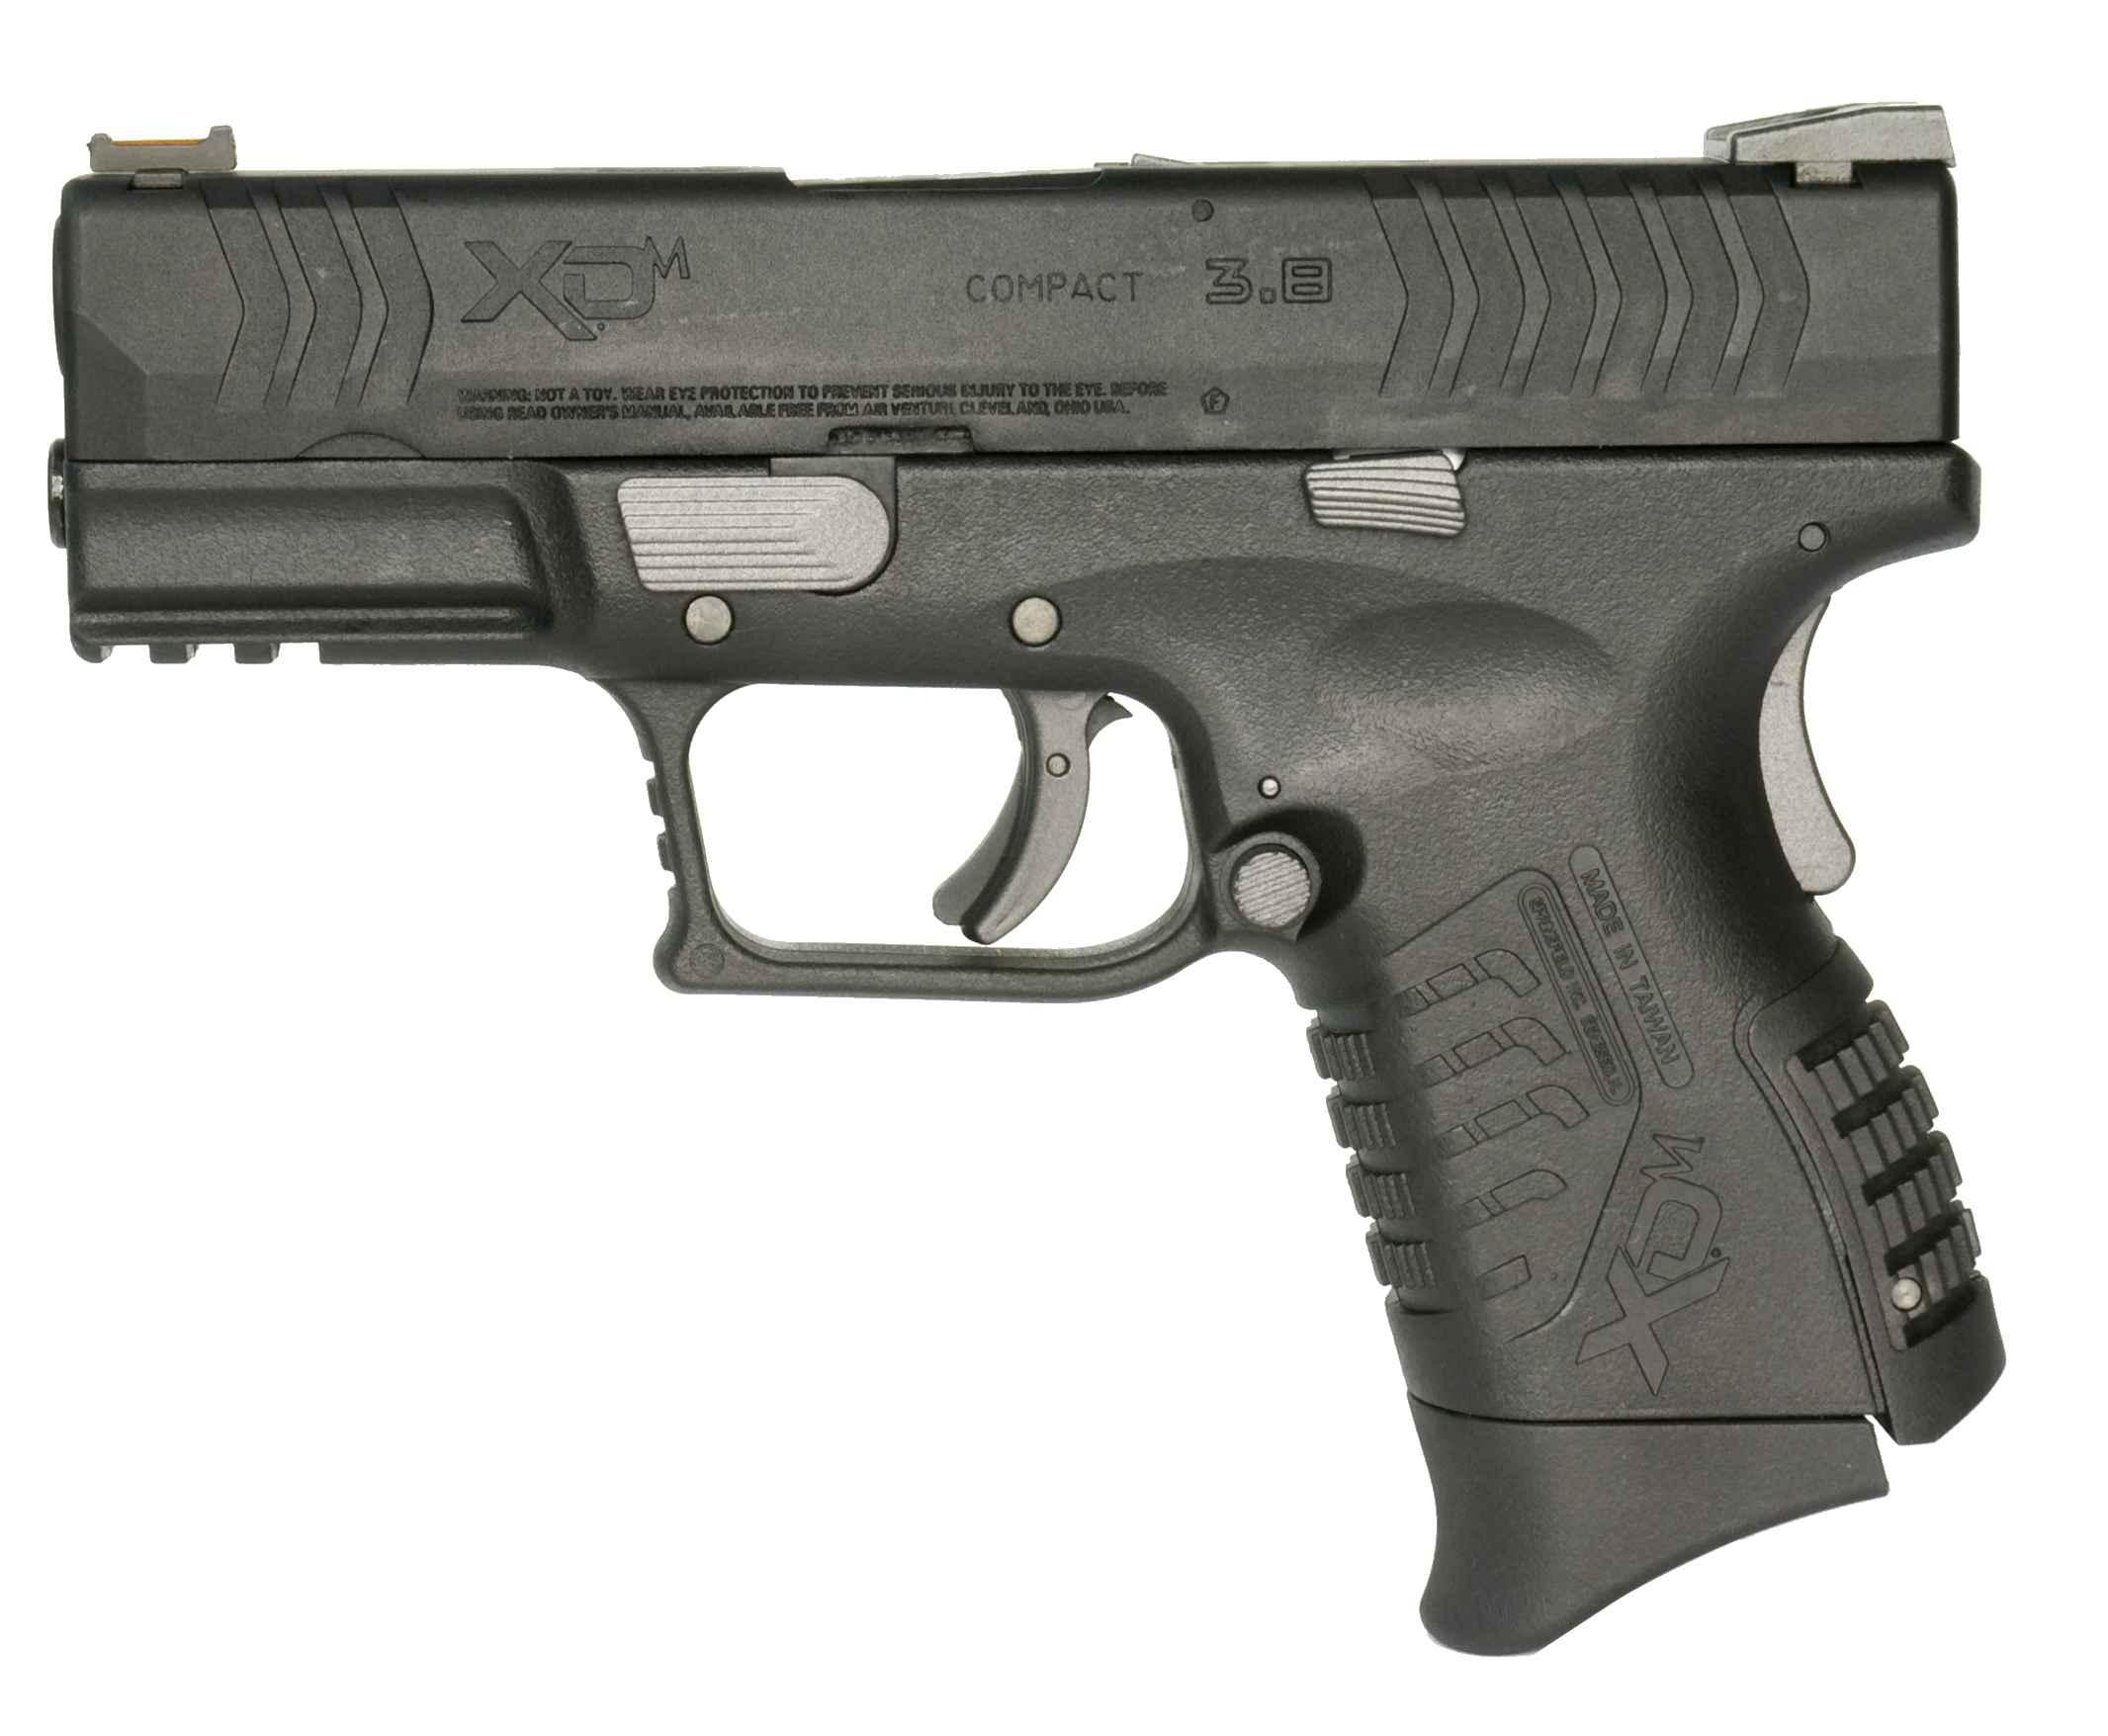 WE(Air Venturi) XDM Compact 3.8インチ GBB BK (SFA正規ライセンス品)